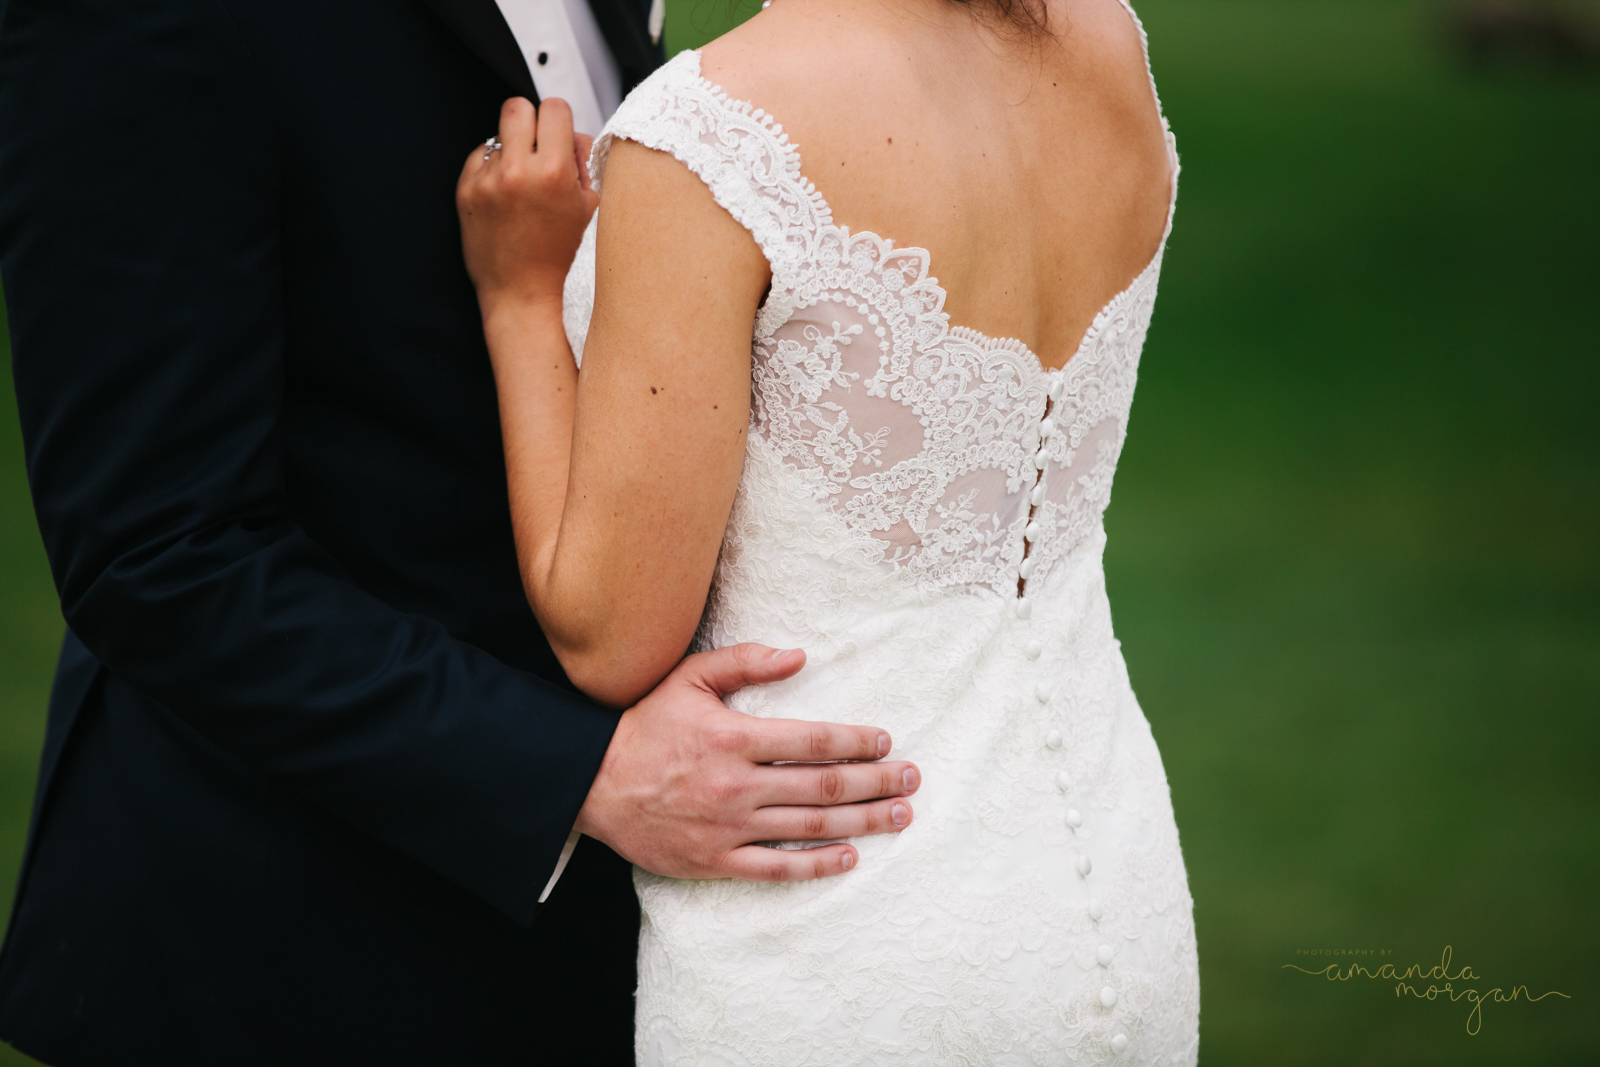 Publick-House-Wedding-Amanda-Morgan-32.jpg